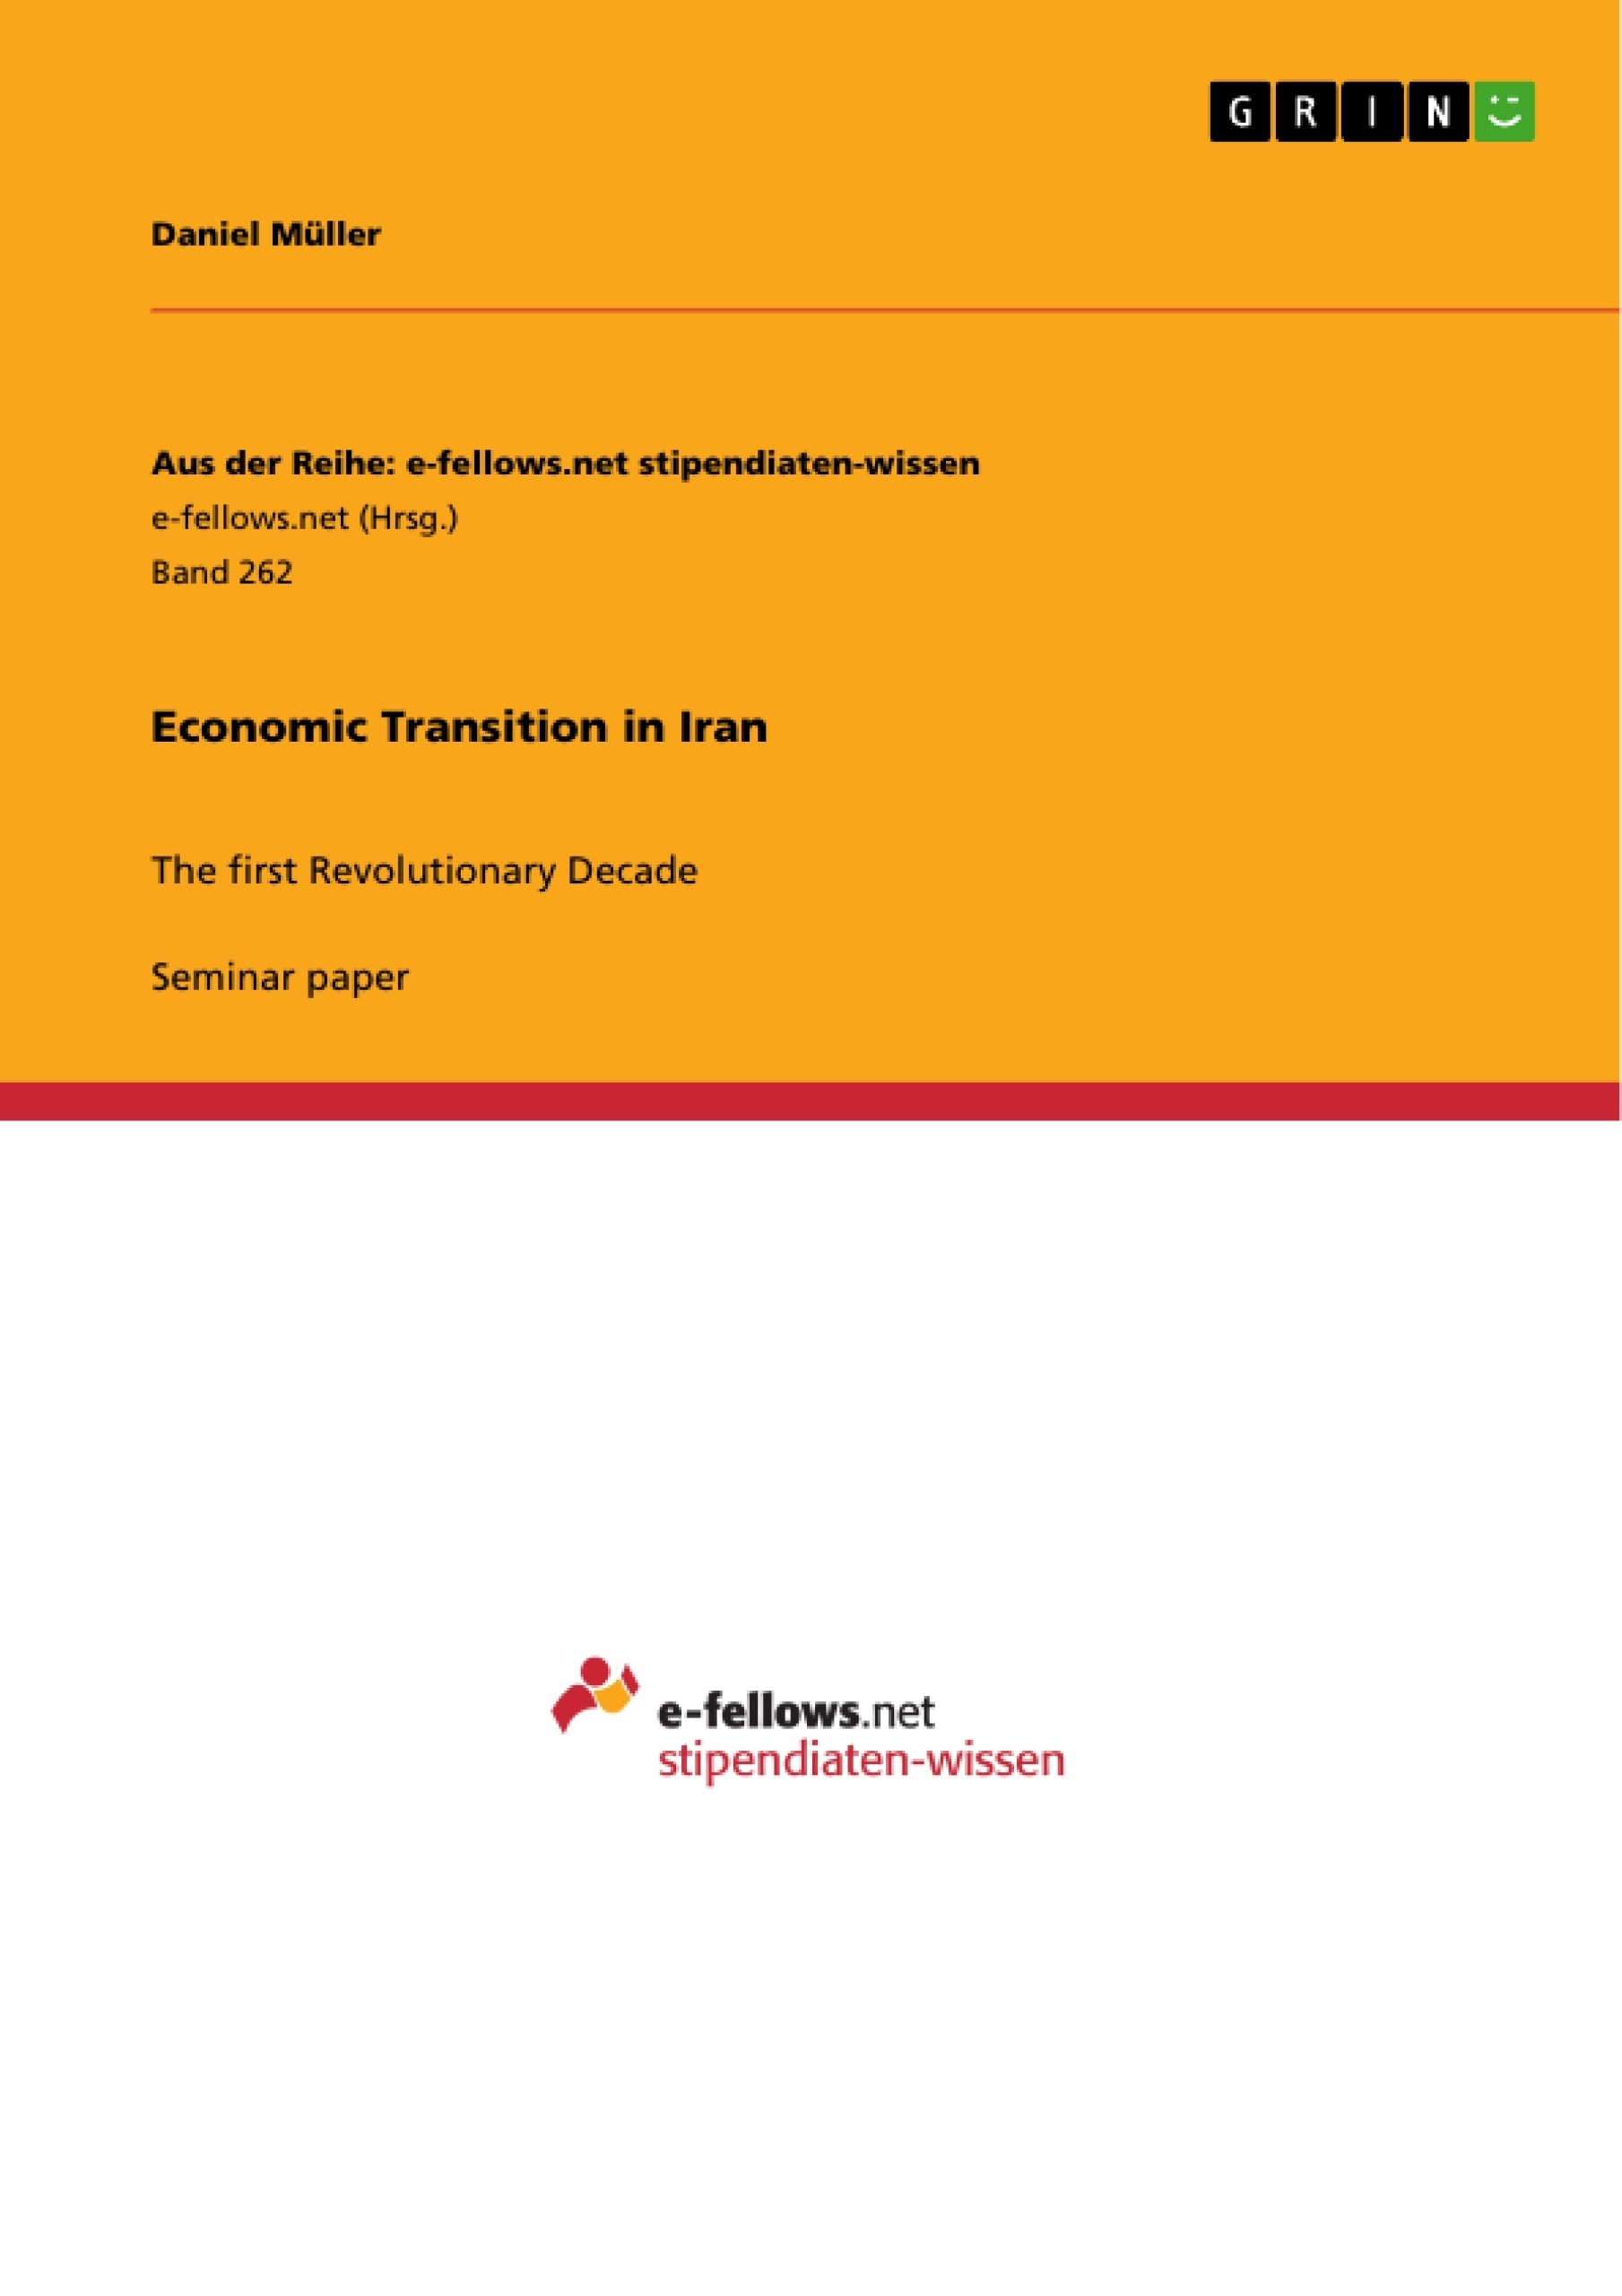 Title: Economic Transition in Iran